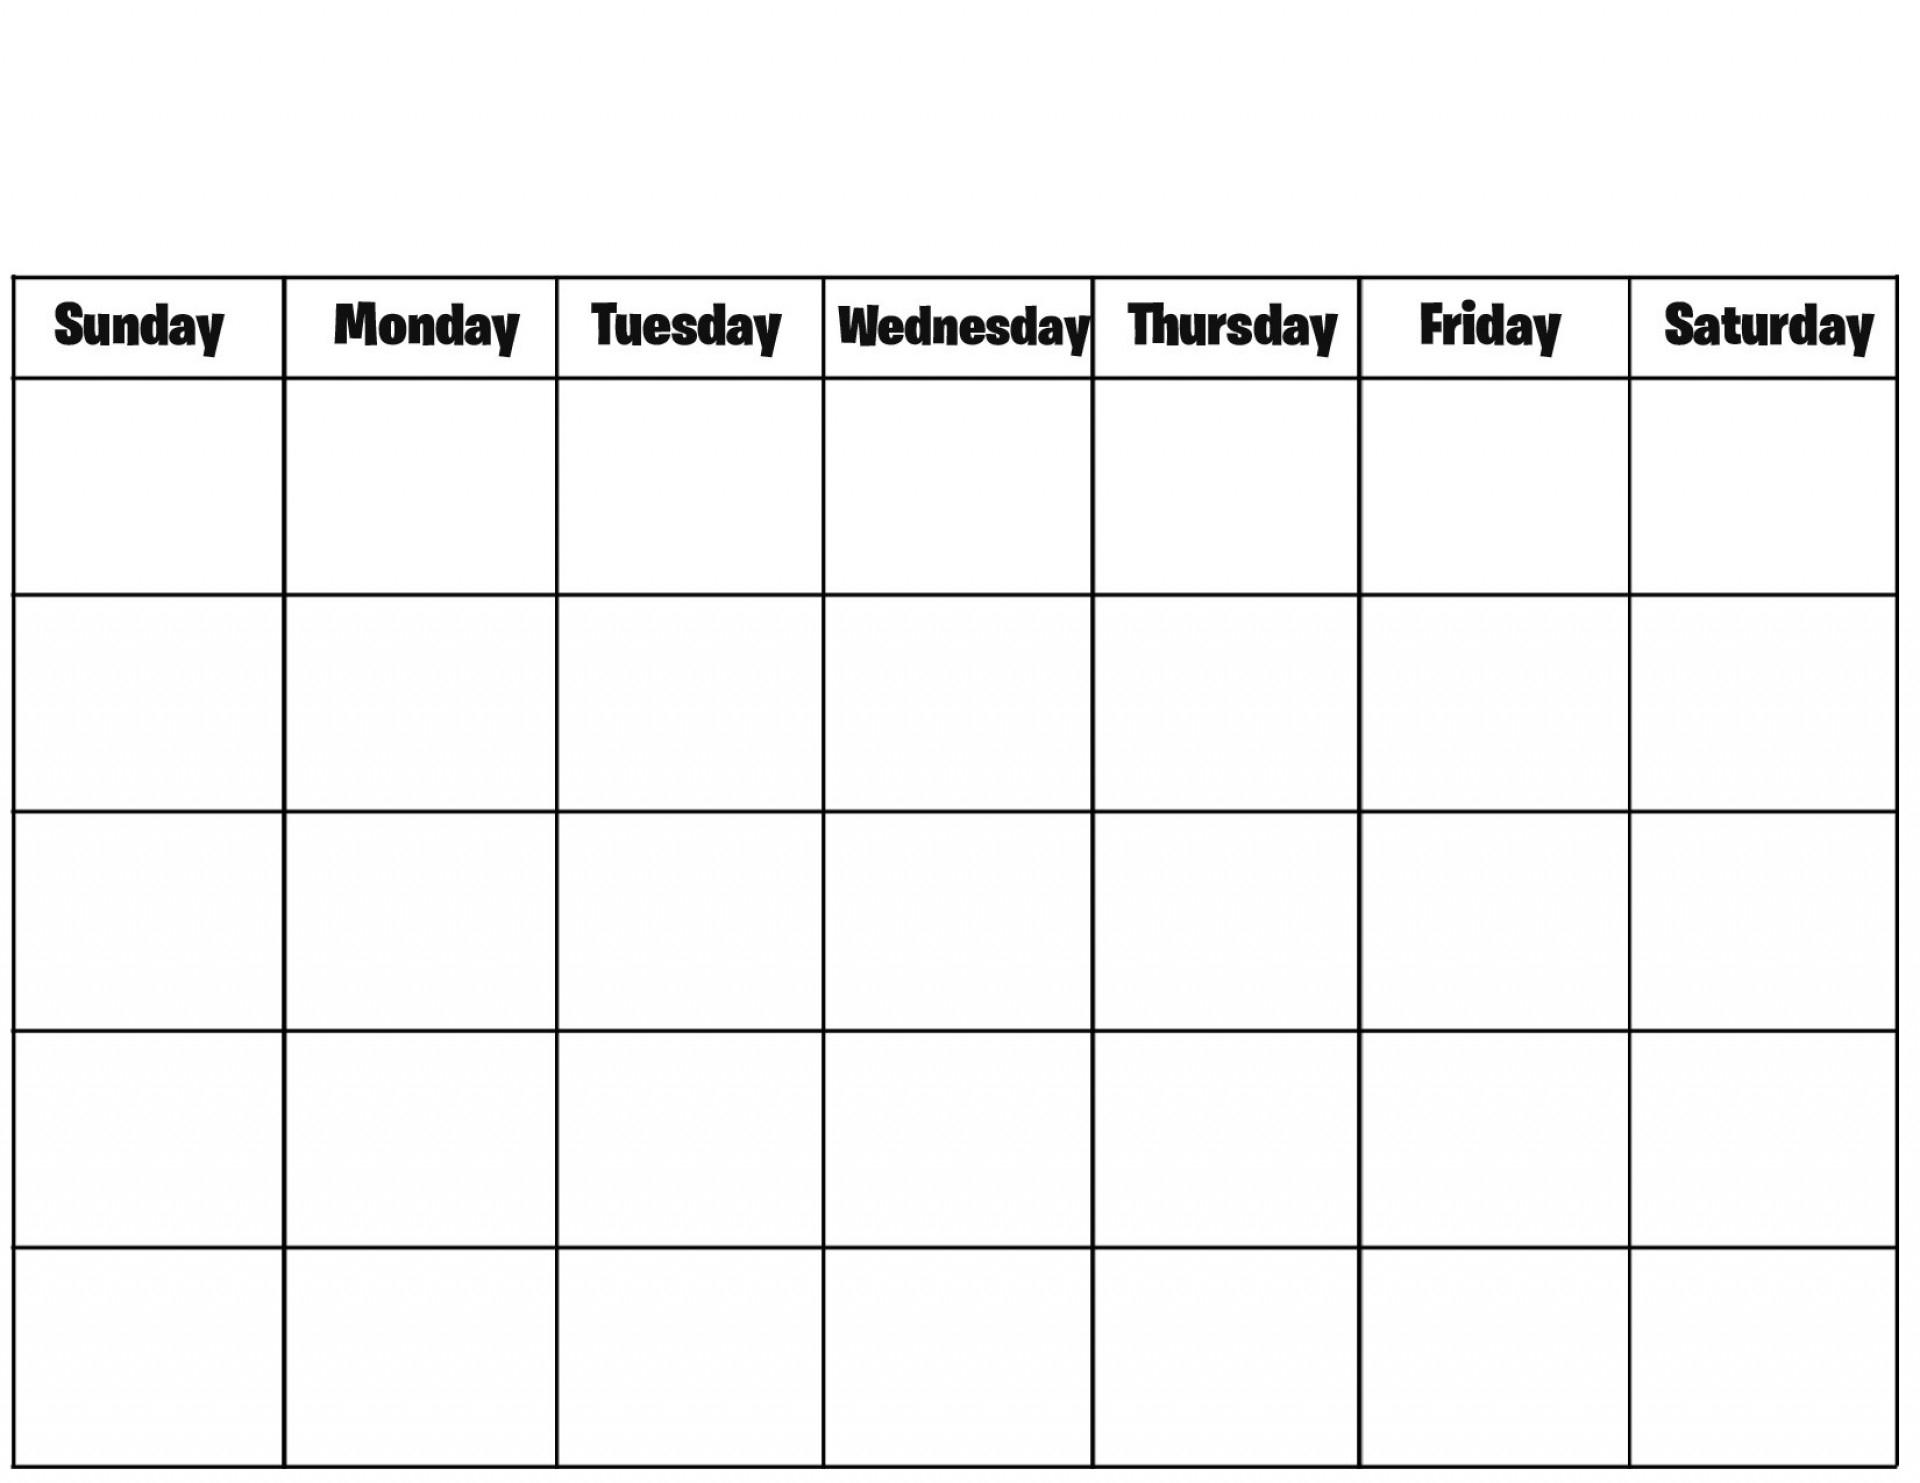 010 Template Ideas June Free Printable Calendar Templates Shocking inside Free Blank Calendar Templates To Print